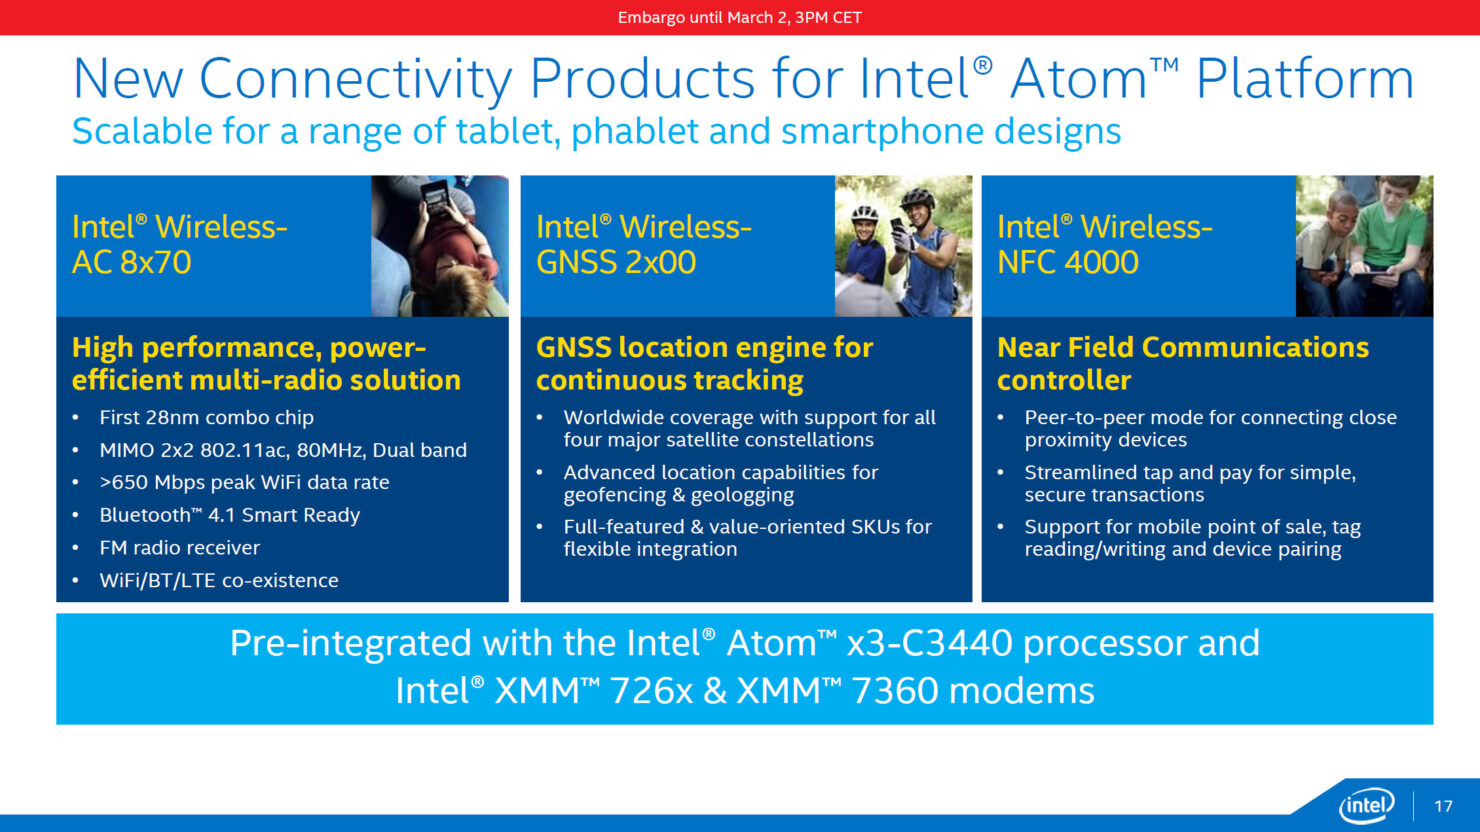 intel-cherry-trail_intel-atom-platform-connectivity-solutions